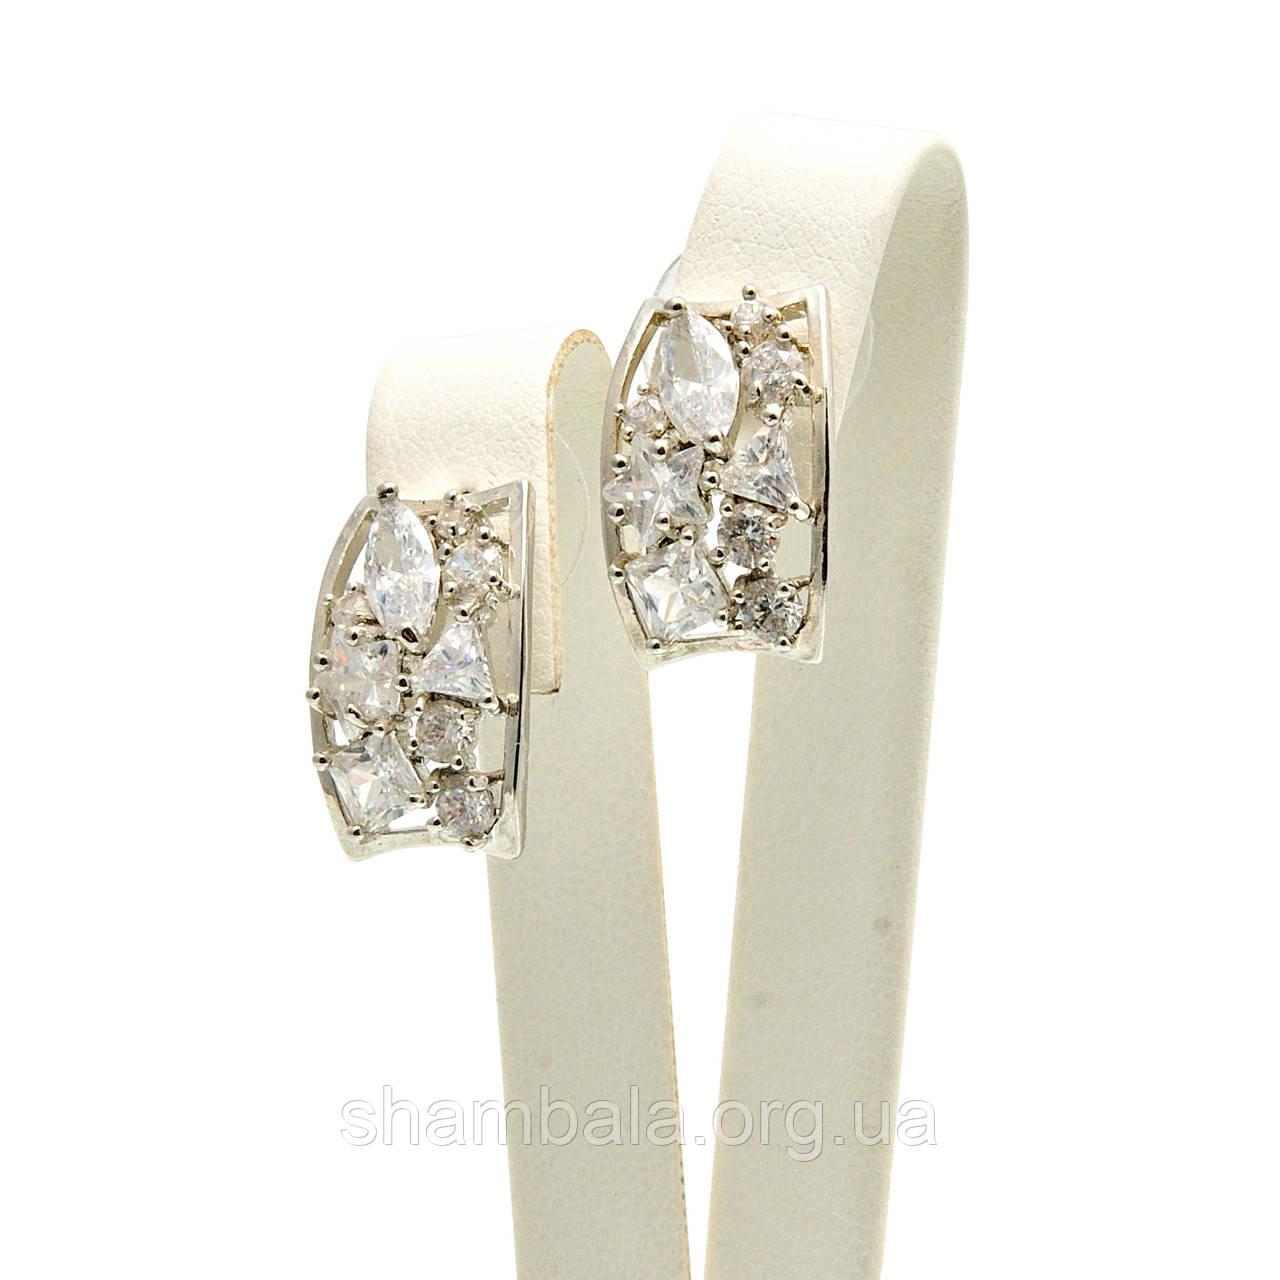 "Серьги Xuping Jewelry ""Large Swarovski stones"" серебро (009612)"